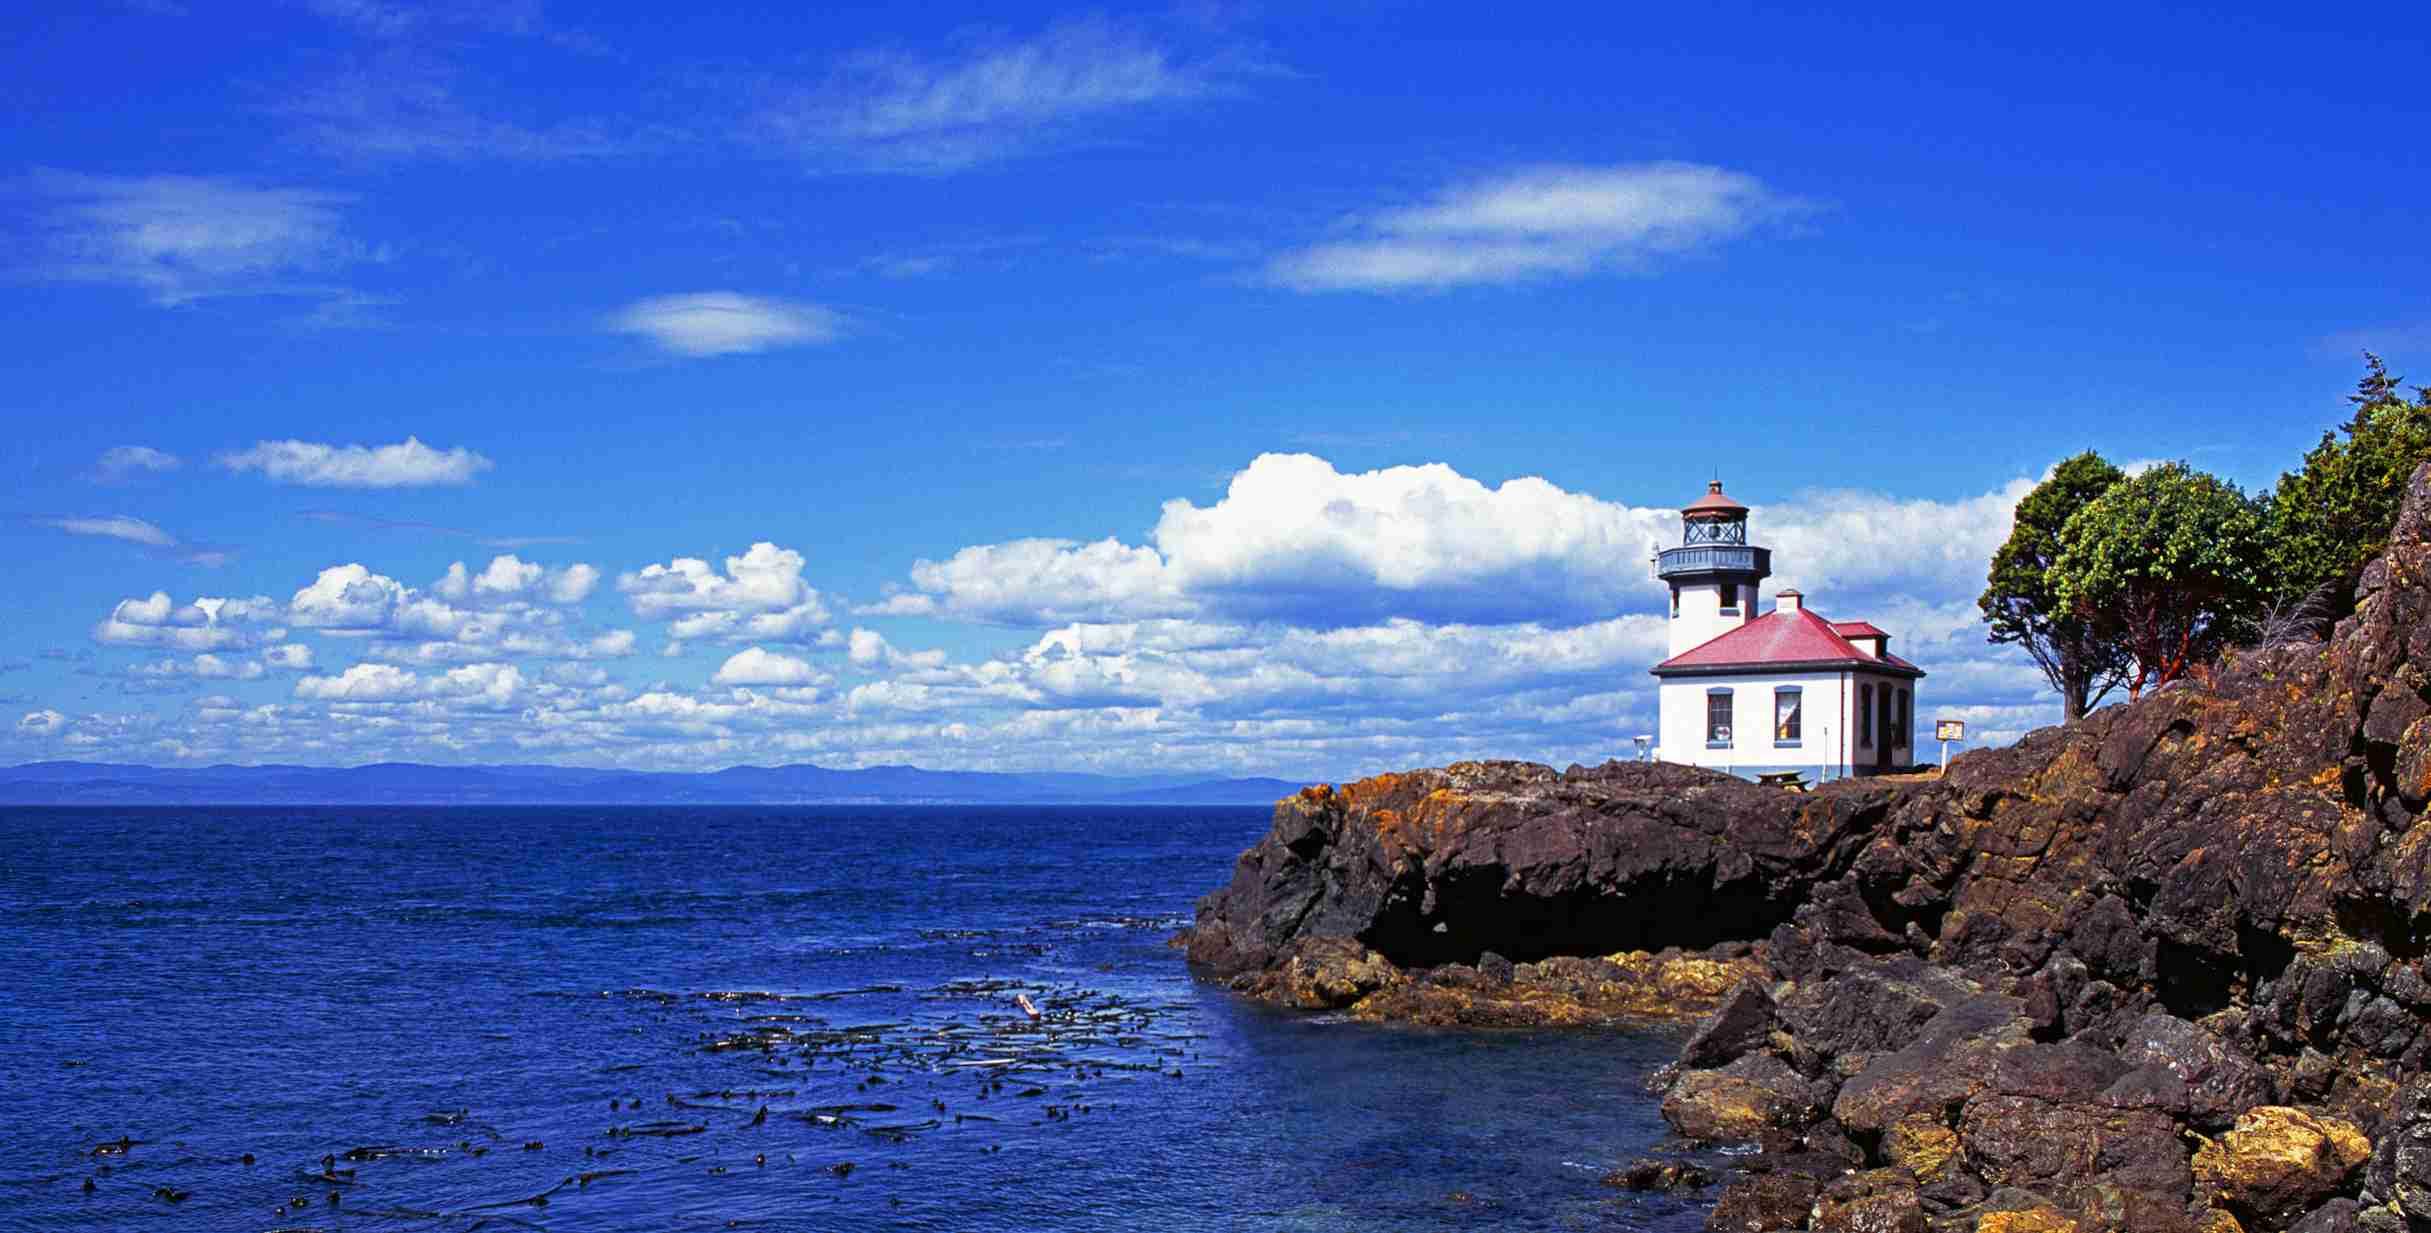 A lighthouse on Puget Sound